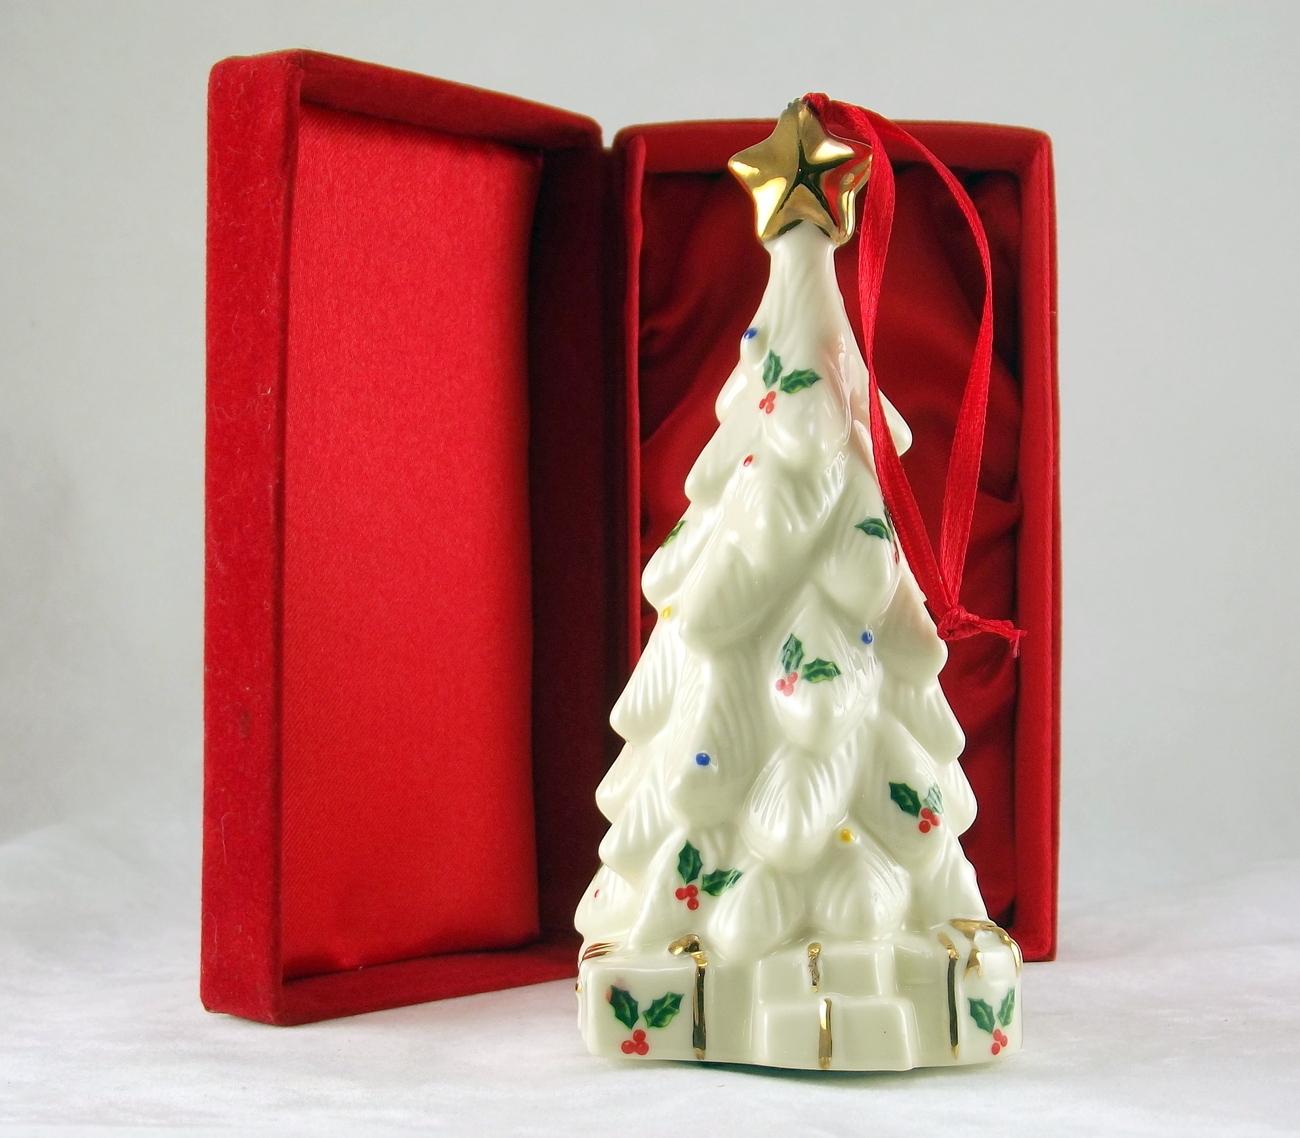 Madison and max xmas tree ornament 2